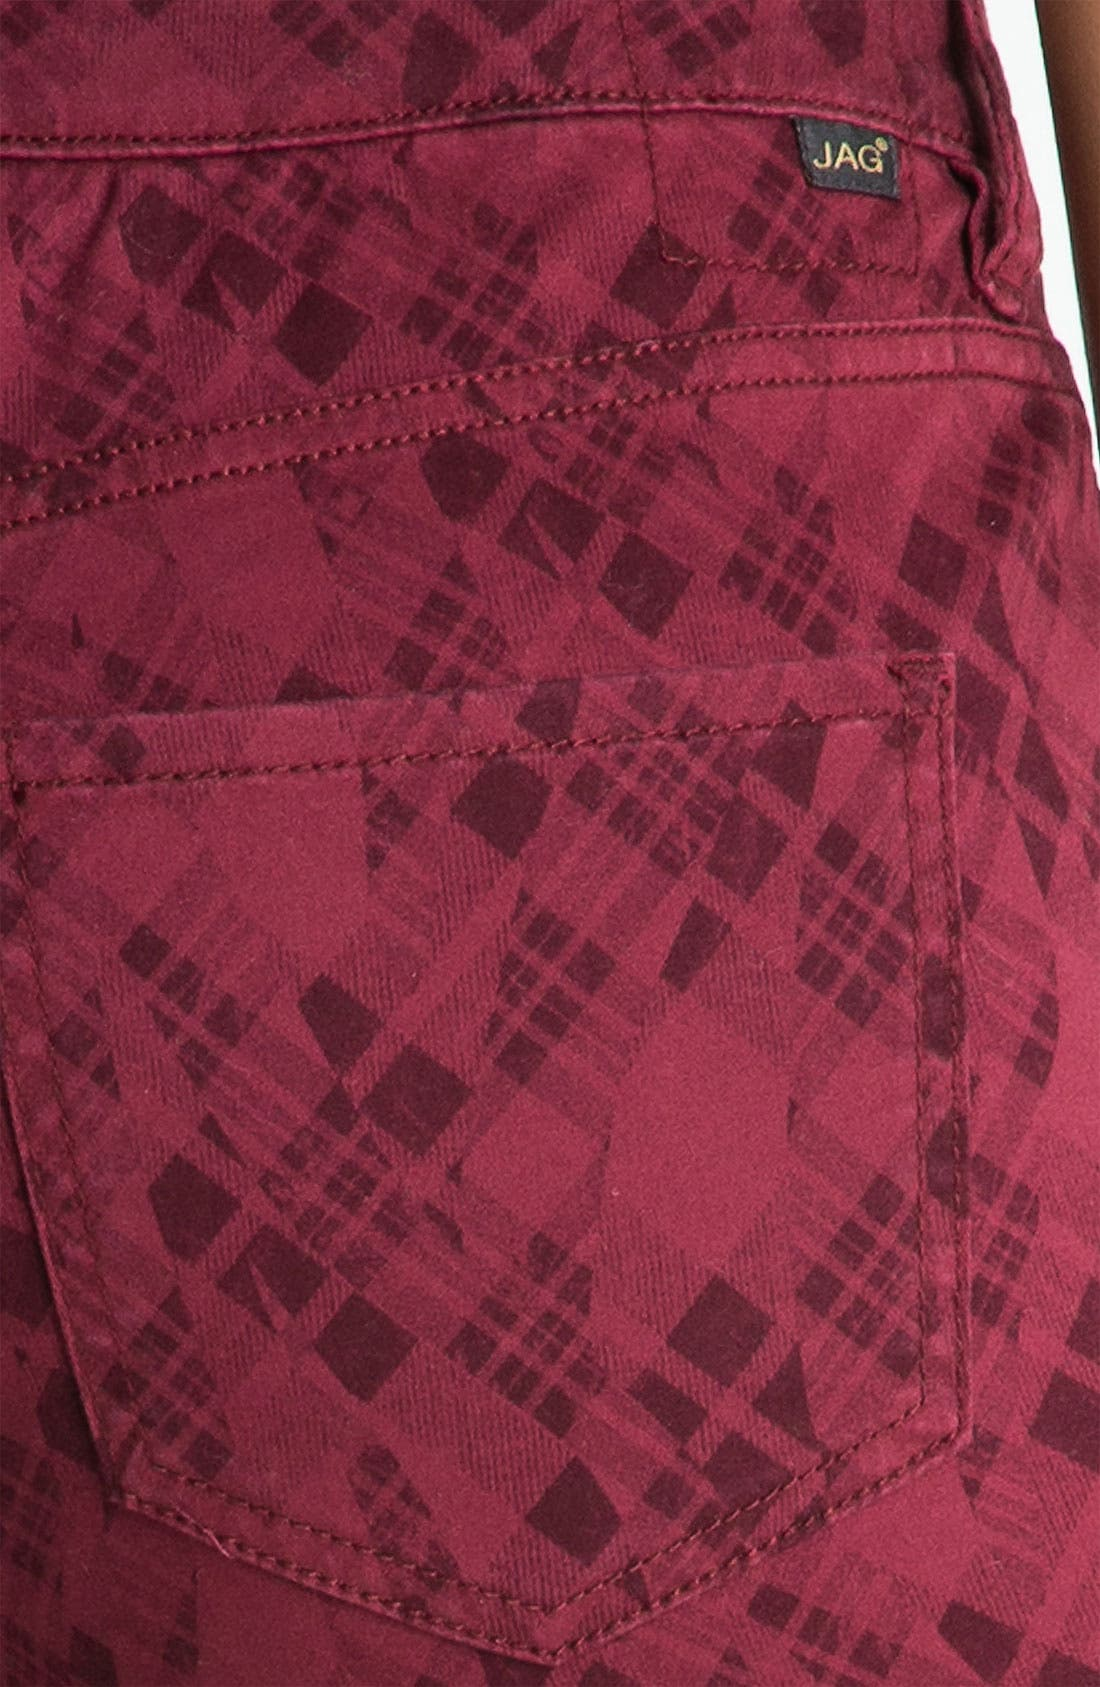 Alternate Image 3  - Jag Jeans 'Chloe - Kingston Plaid' Skinny Jeans (Online Exclusive)